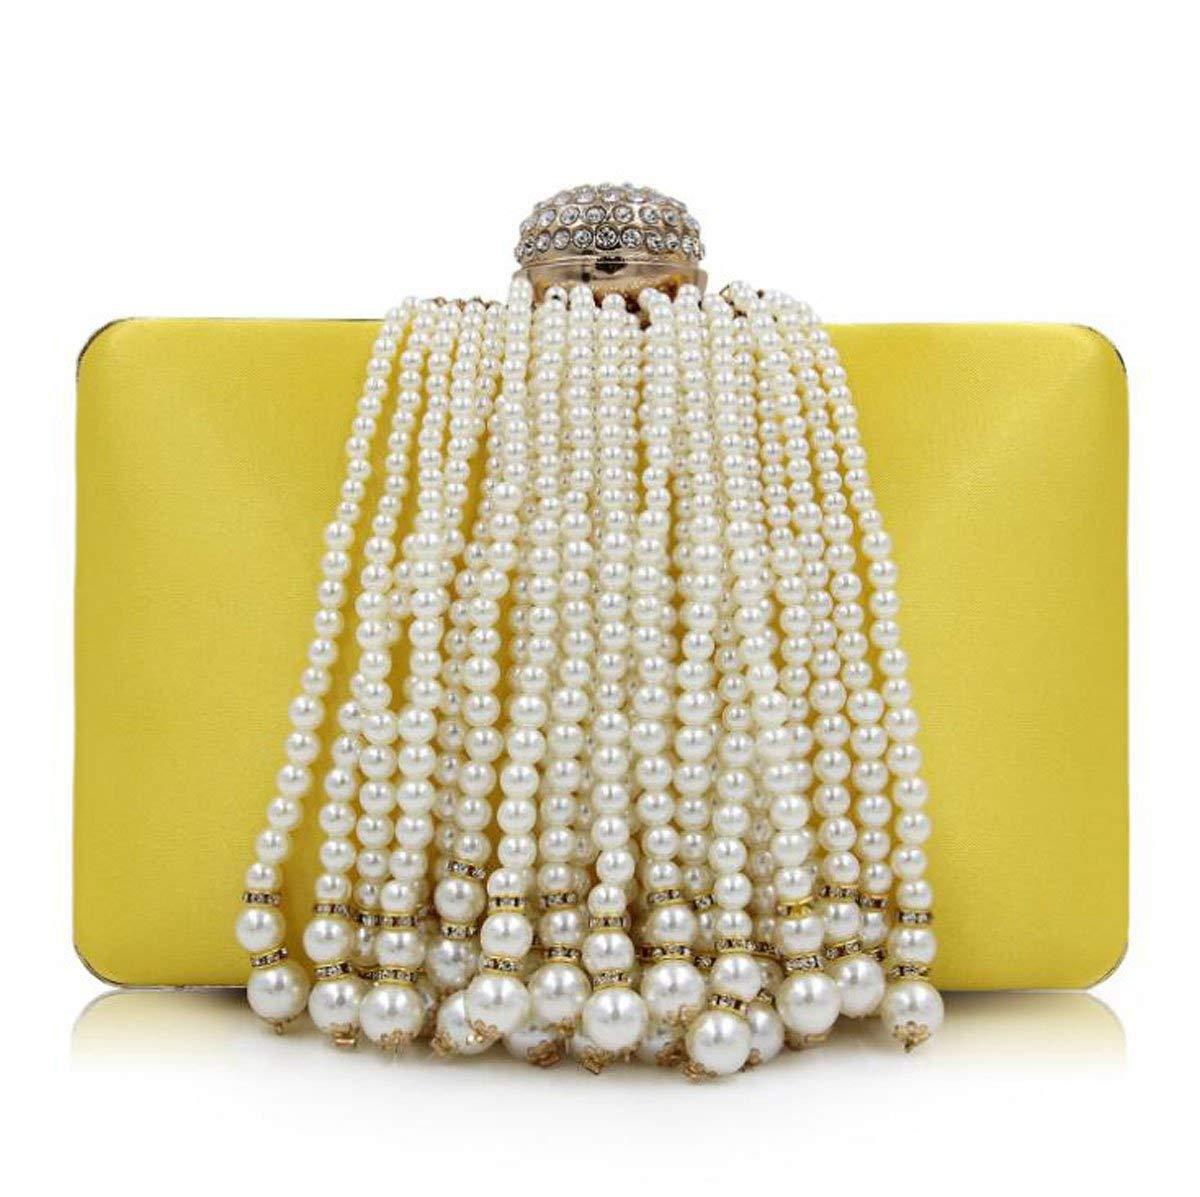 Get Quotations · Women Pearl Clutches Beaded Tassel Evening Bag Satin Clutch  Purse Handbag Cross-Body Bags Totes 3d8d647b8c69